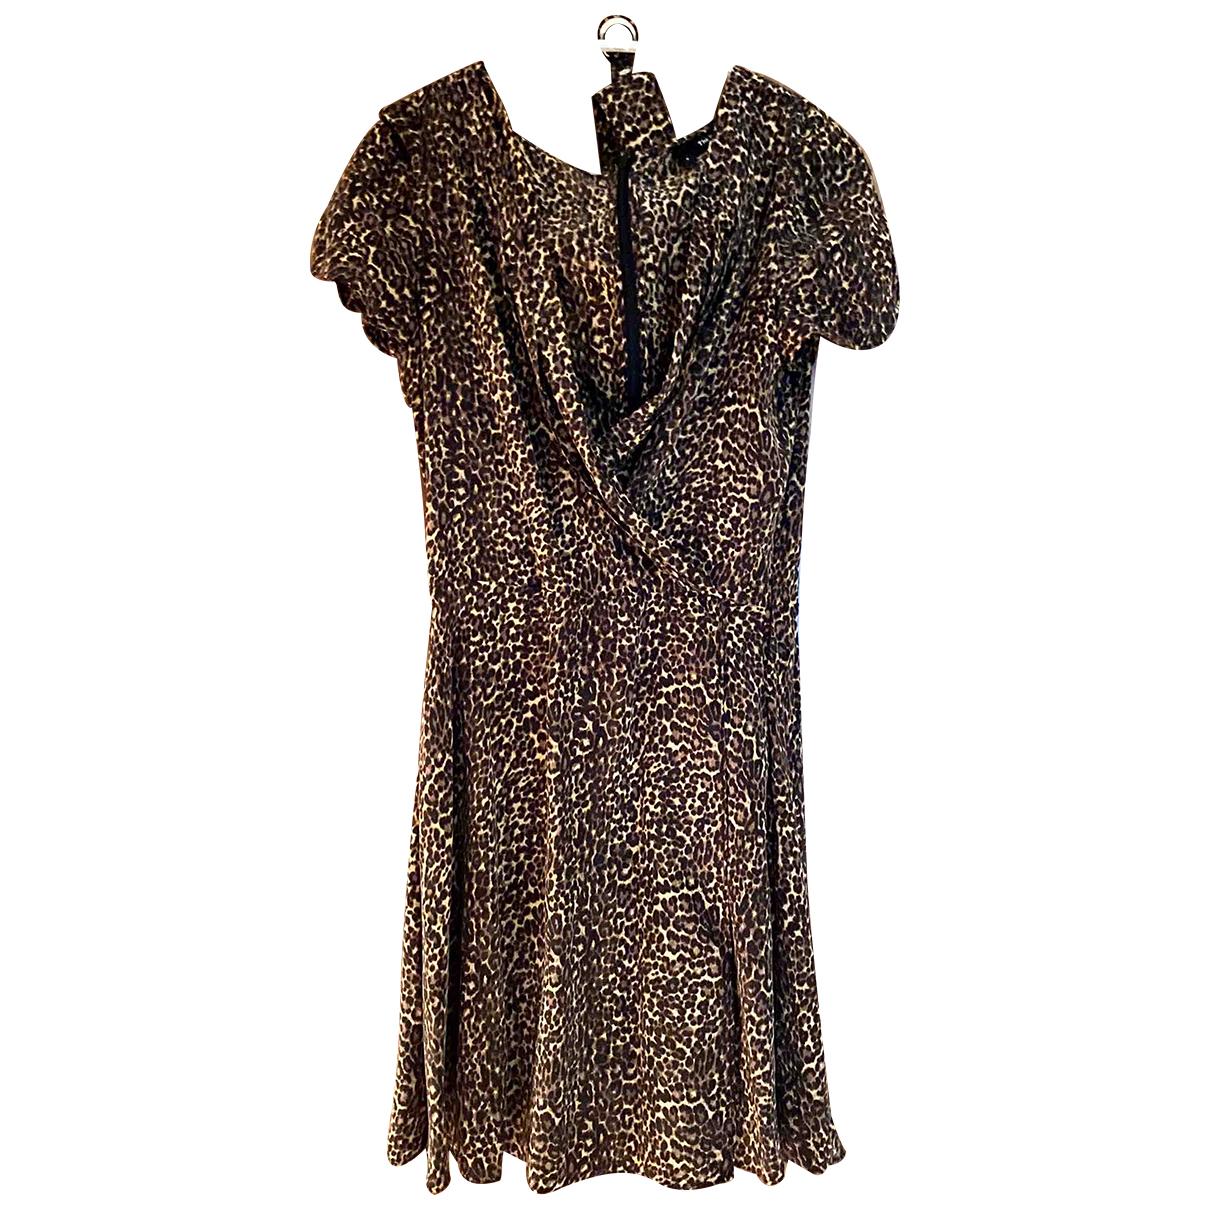 The Kooples N Multicolour Silk dress for Women 8 UK